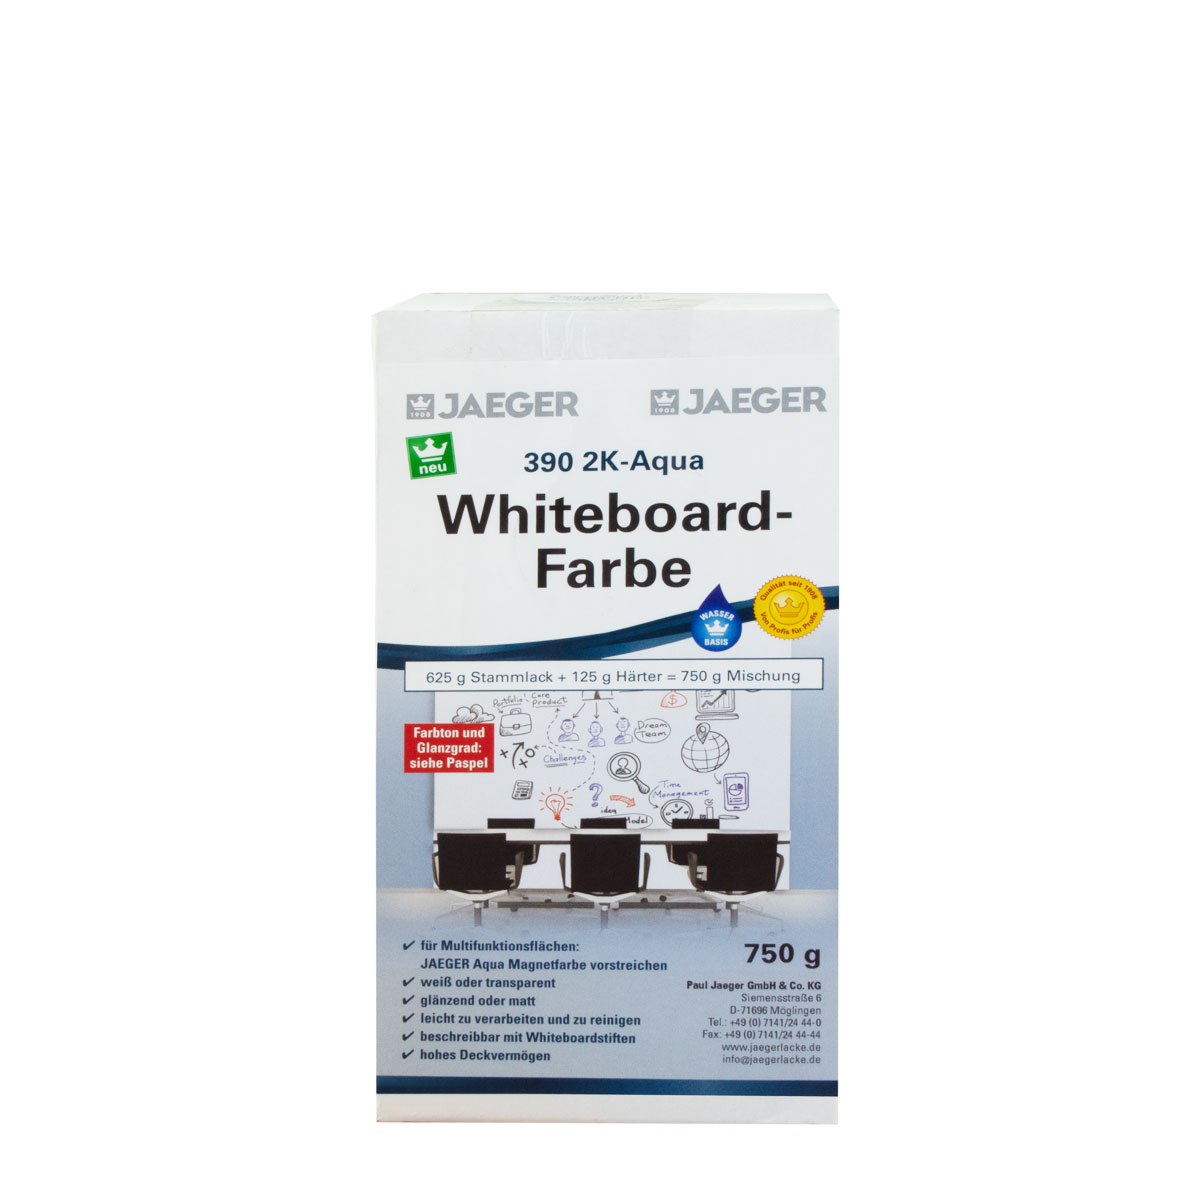 Jaeger 2K-Aqua Whiteboardfarbe Weiss Ral 9016 Glänzend 750g